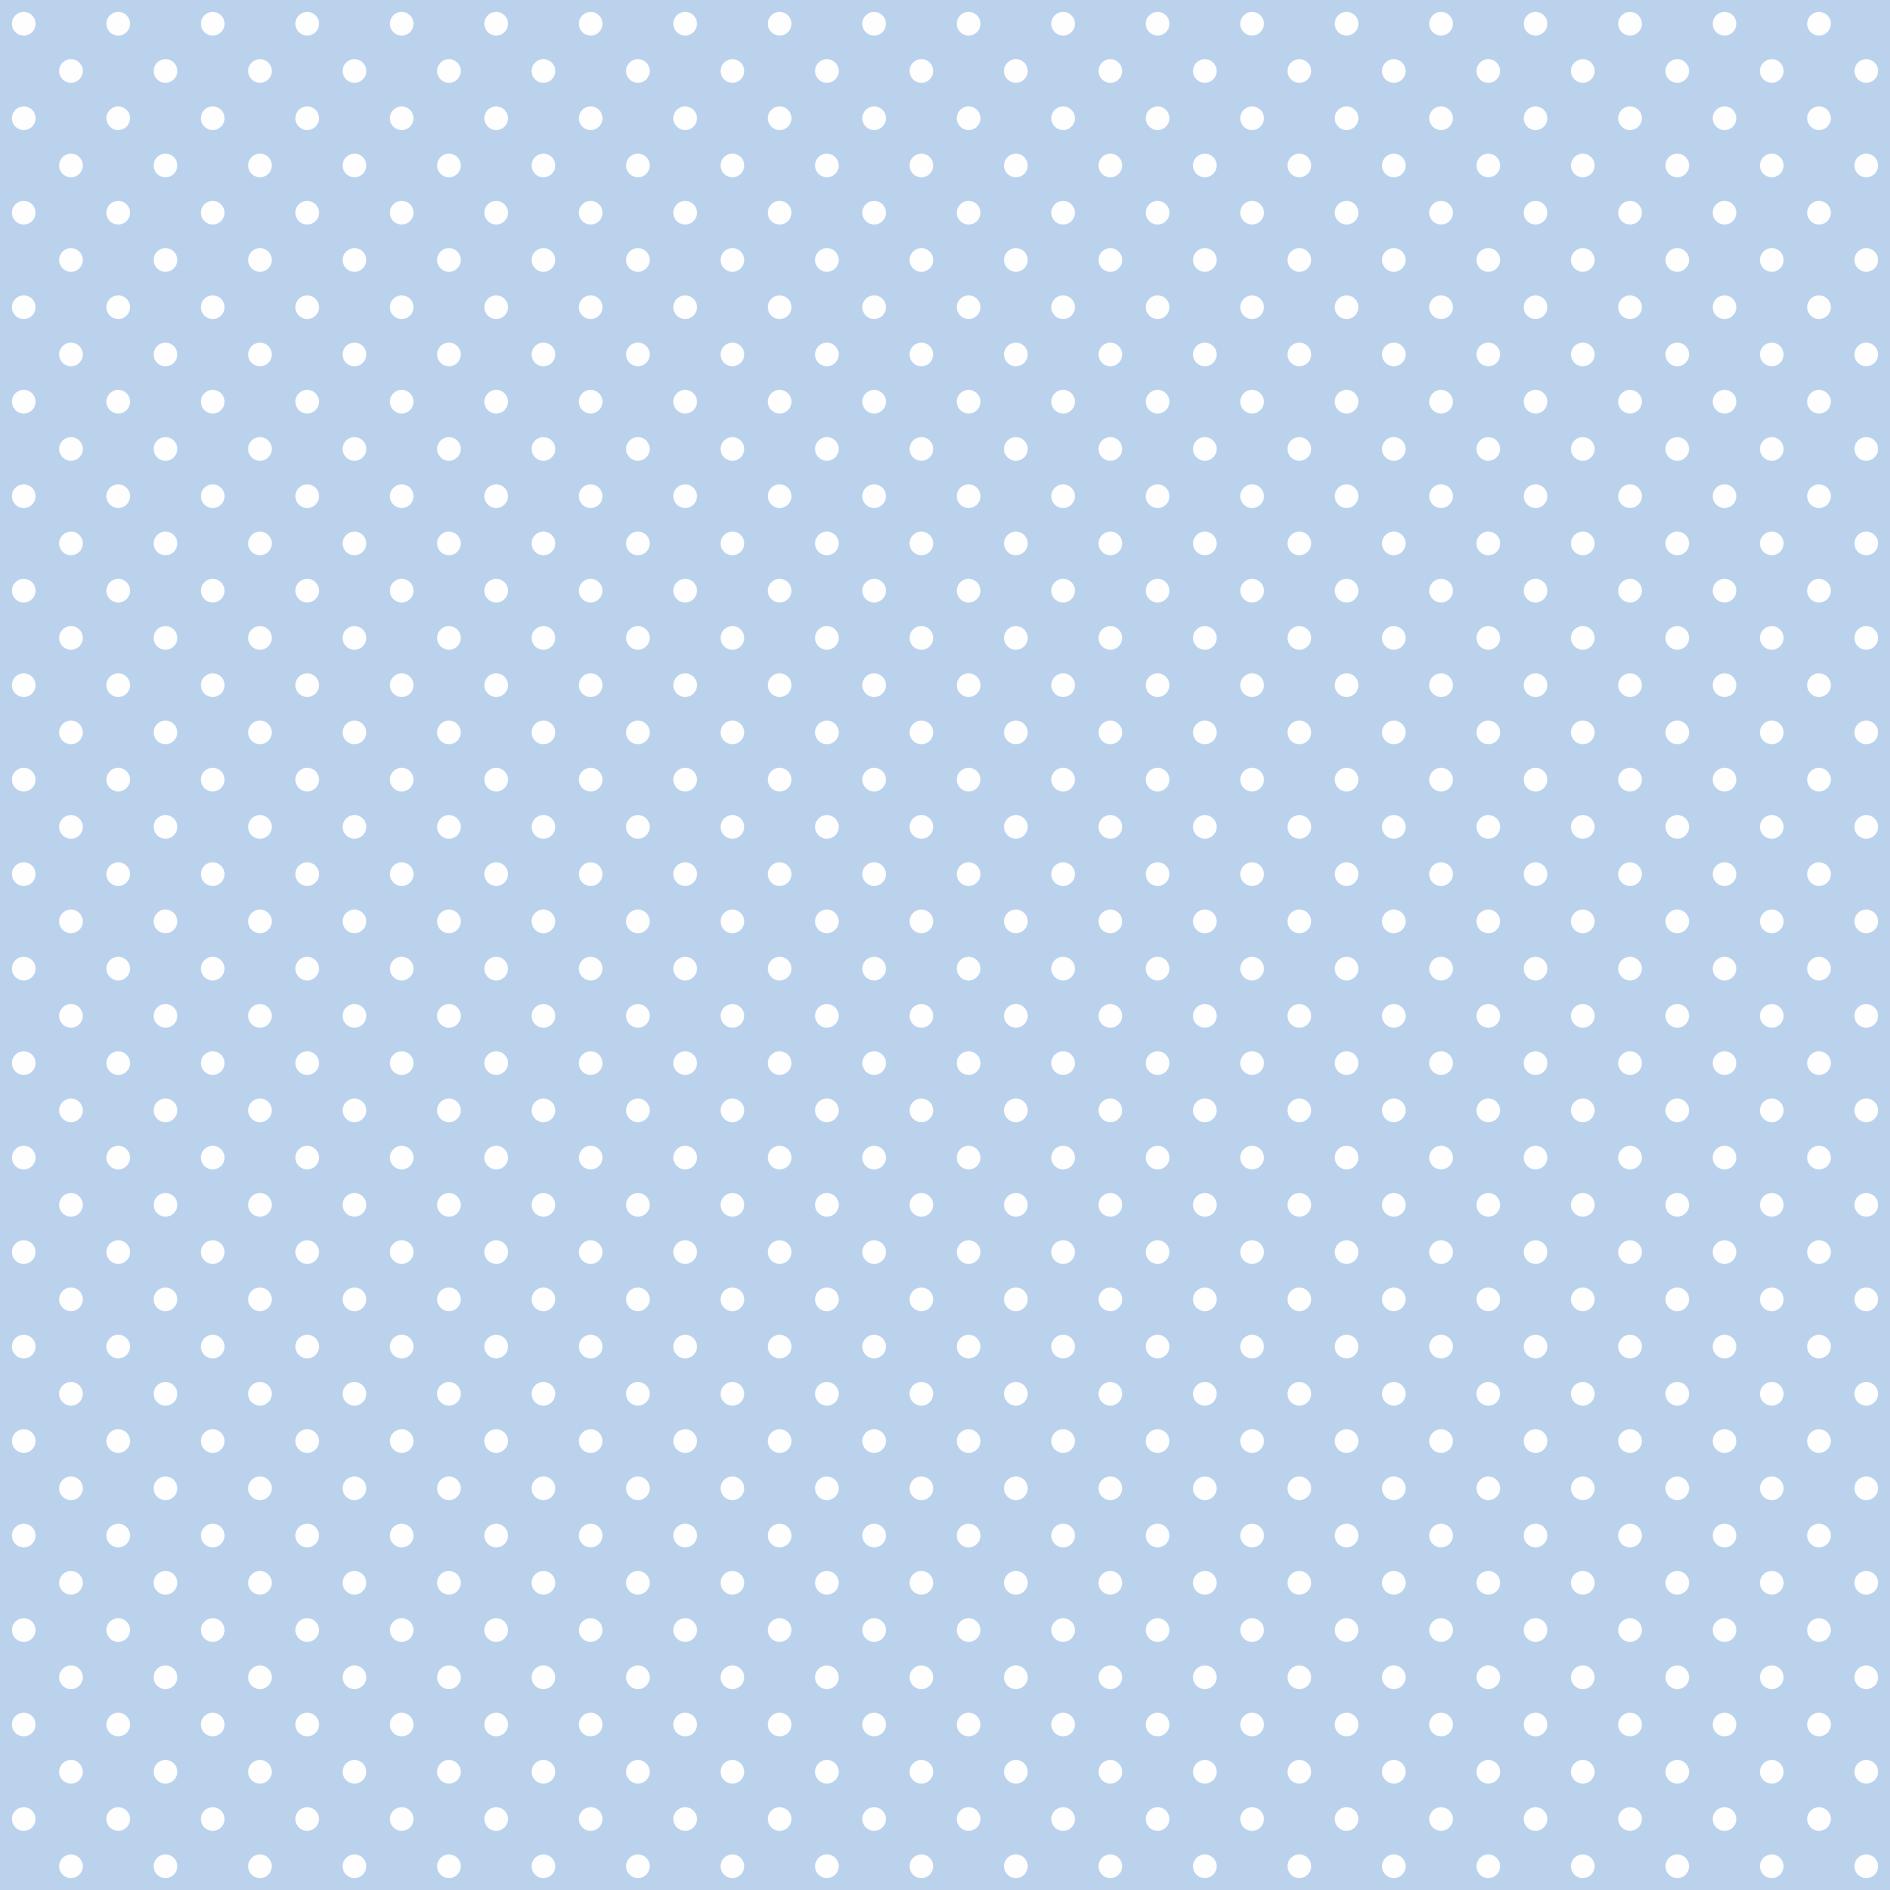 Tecido Tricoline estampado Poá branco fundo azul claro